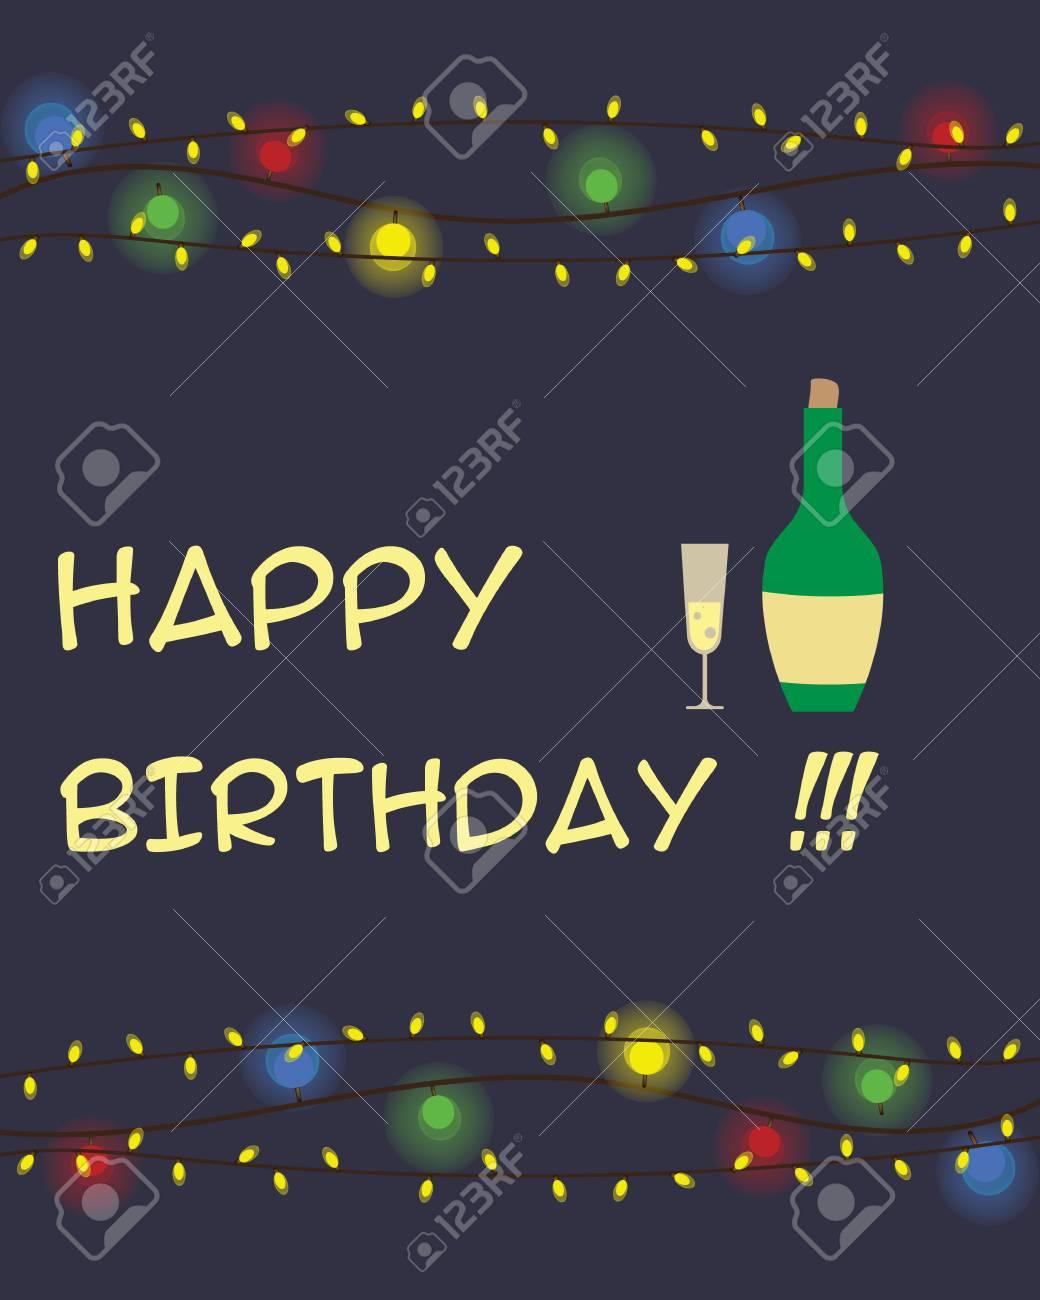 Happy birthday greeting card on the dark violet background with happy birthday greeting card on the dark violet background with bottle of champagne stock vector m4hsunfo